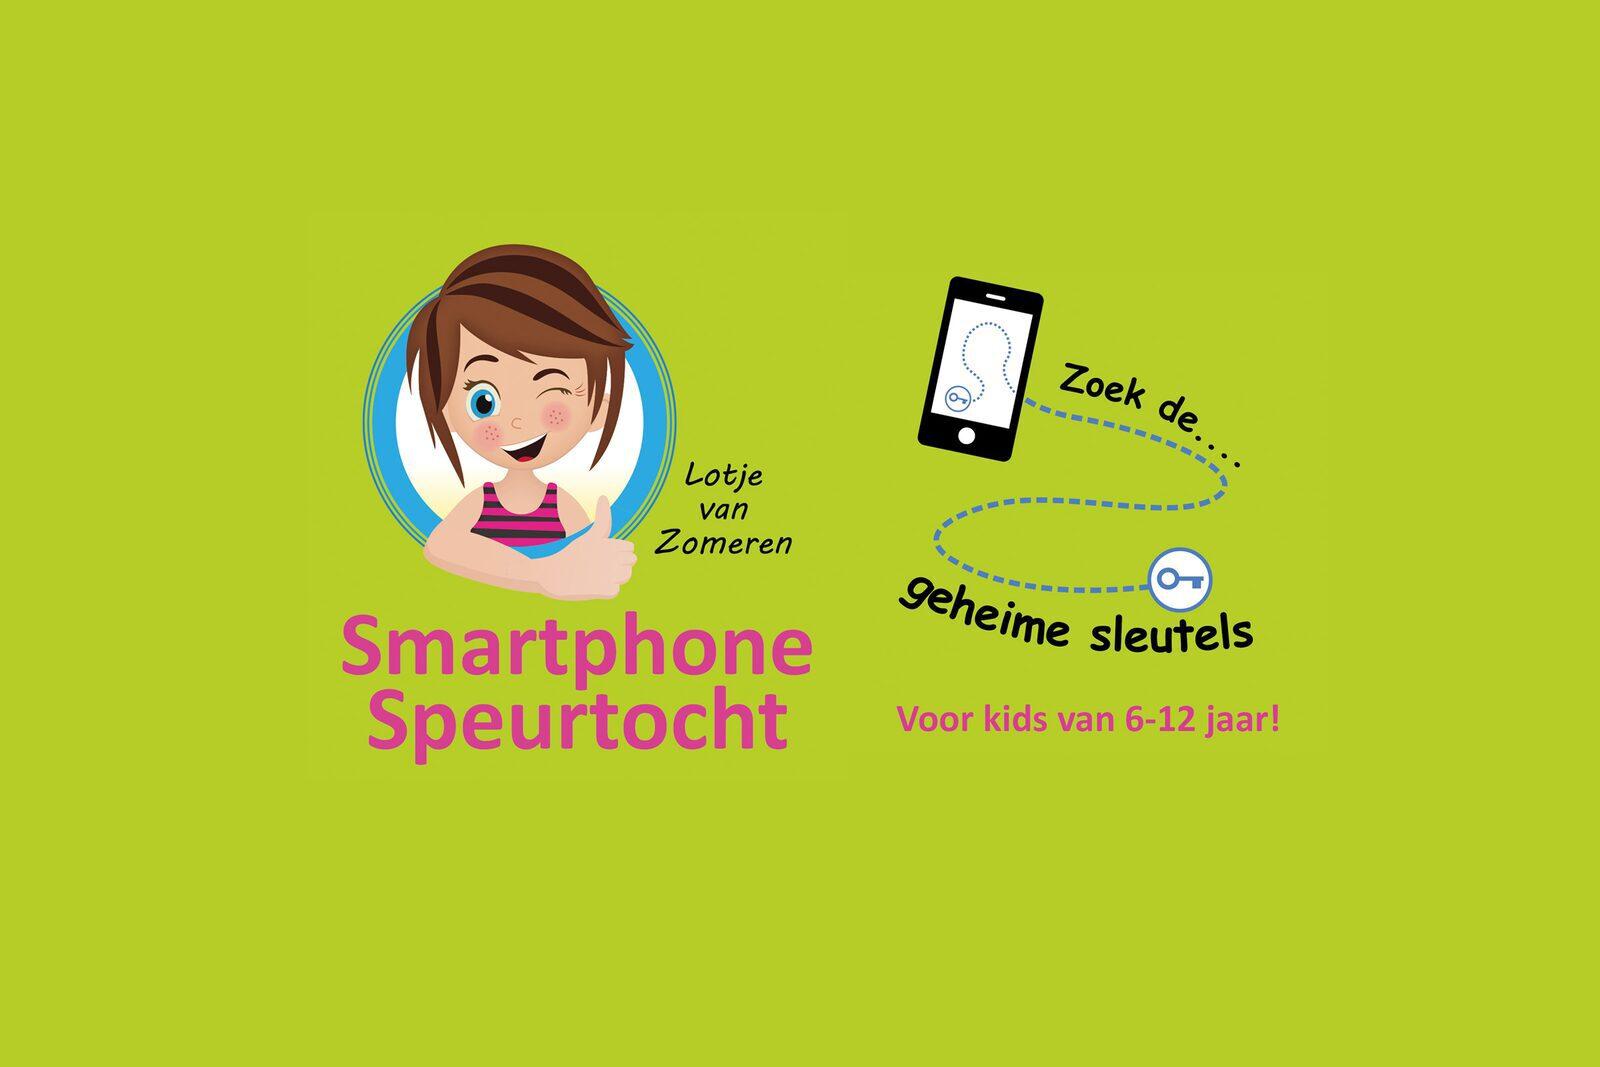 Smartphone speurtocht